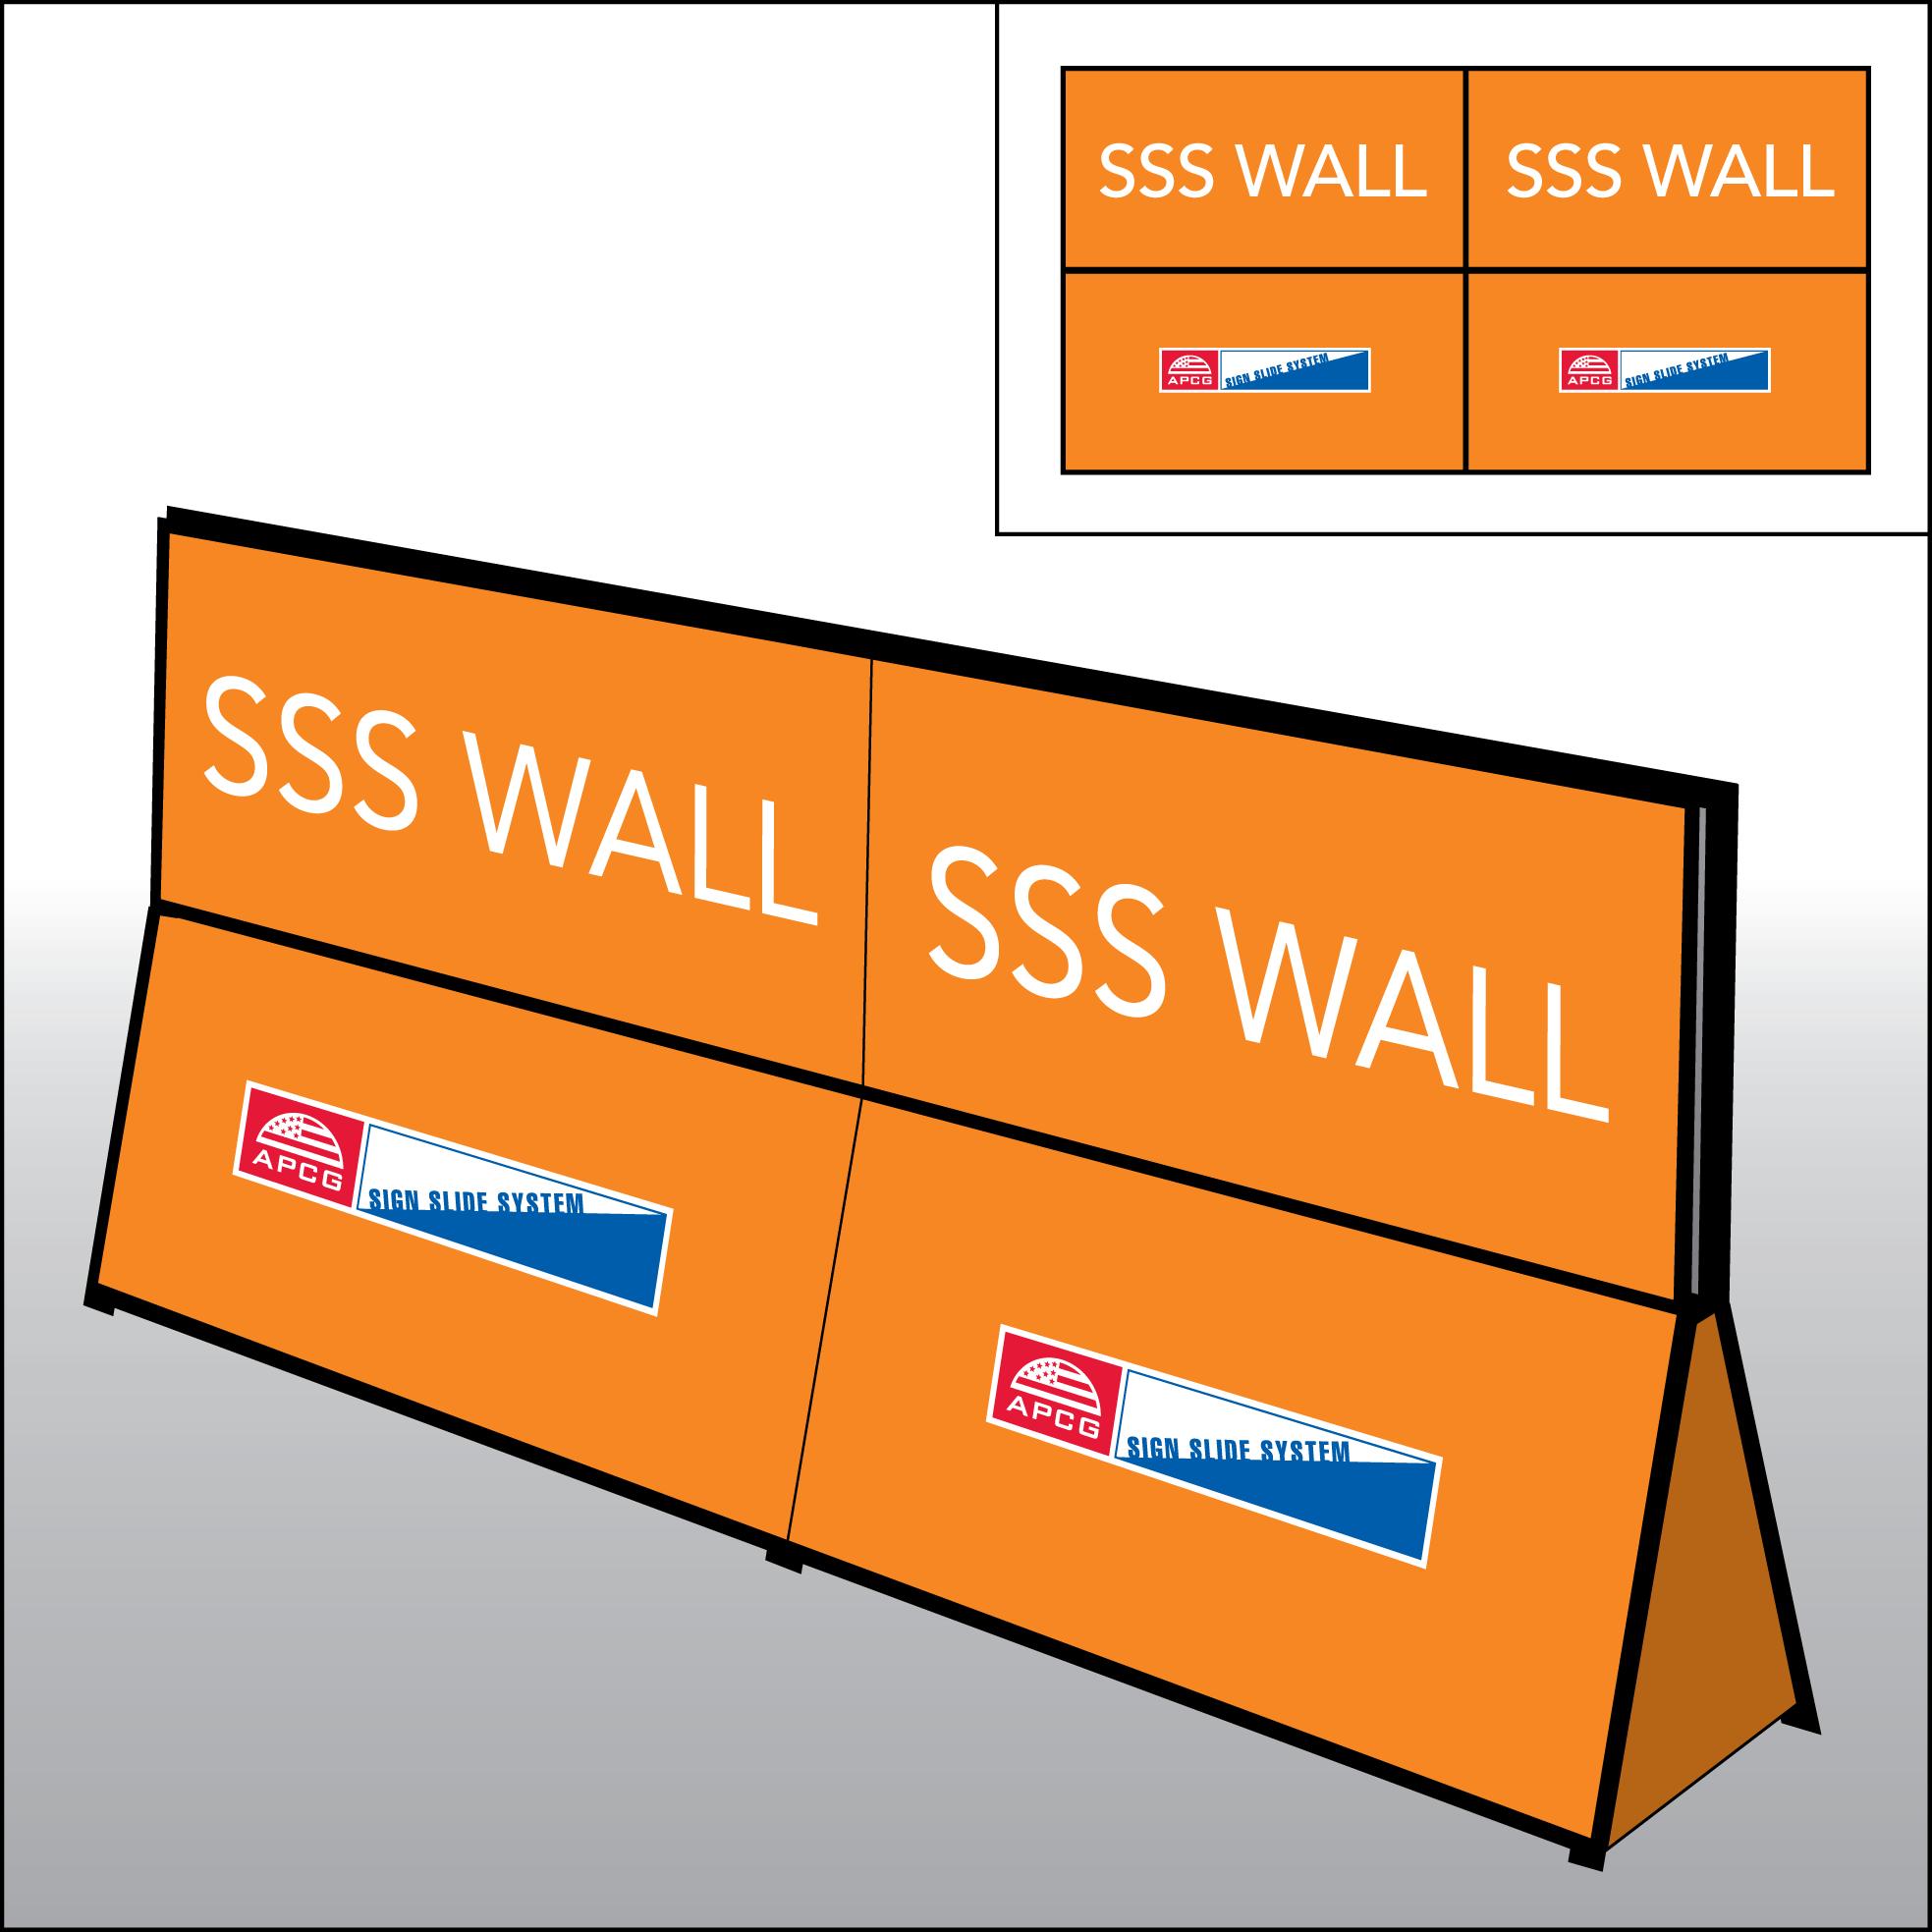 SSS_Walls3.png